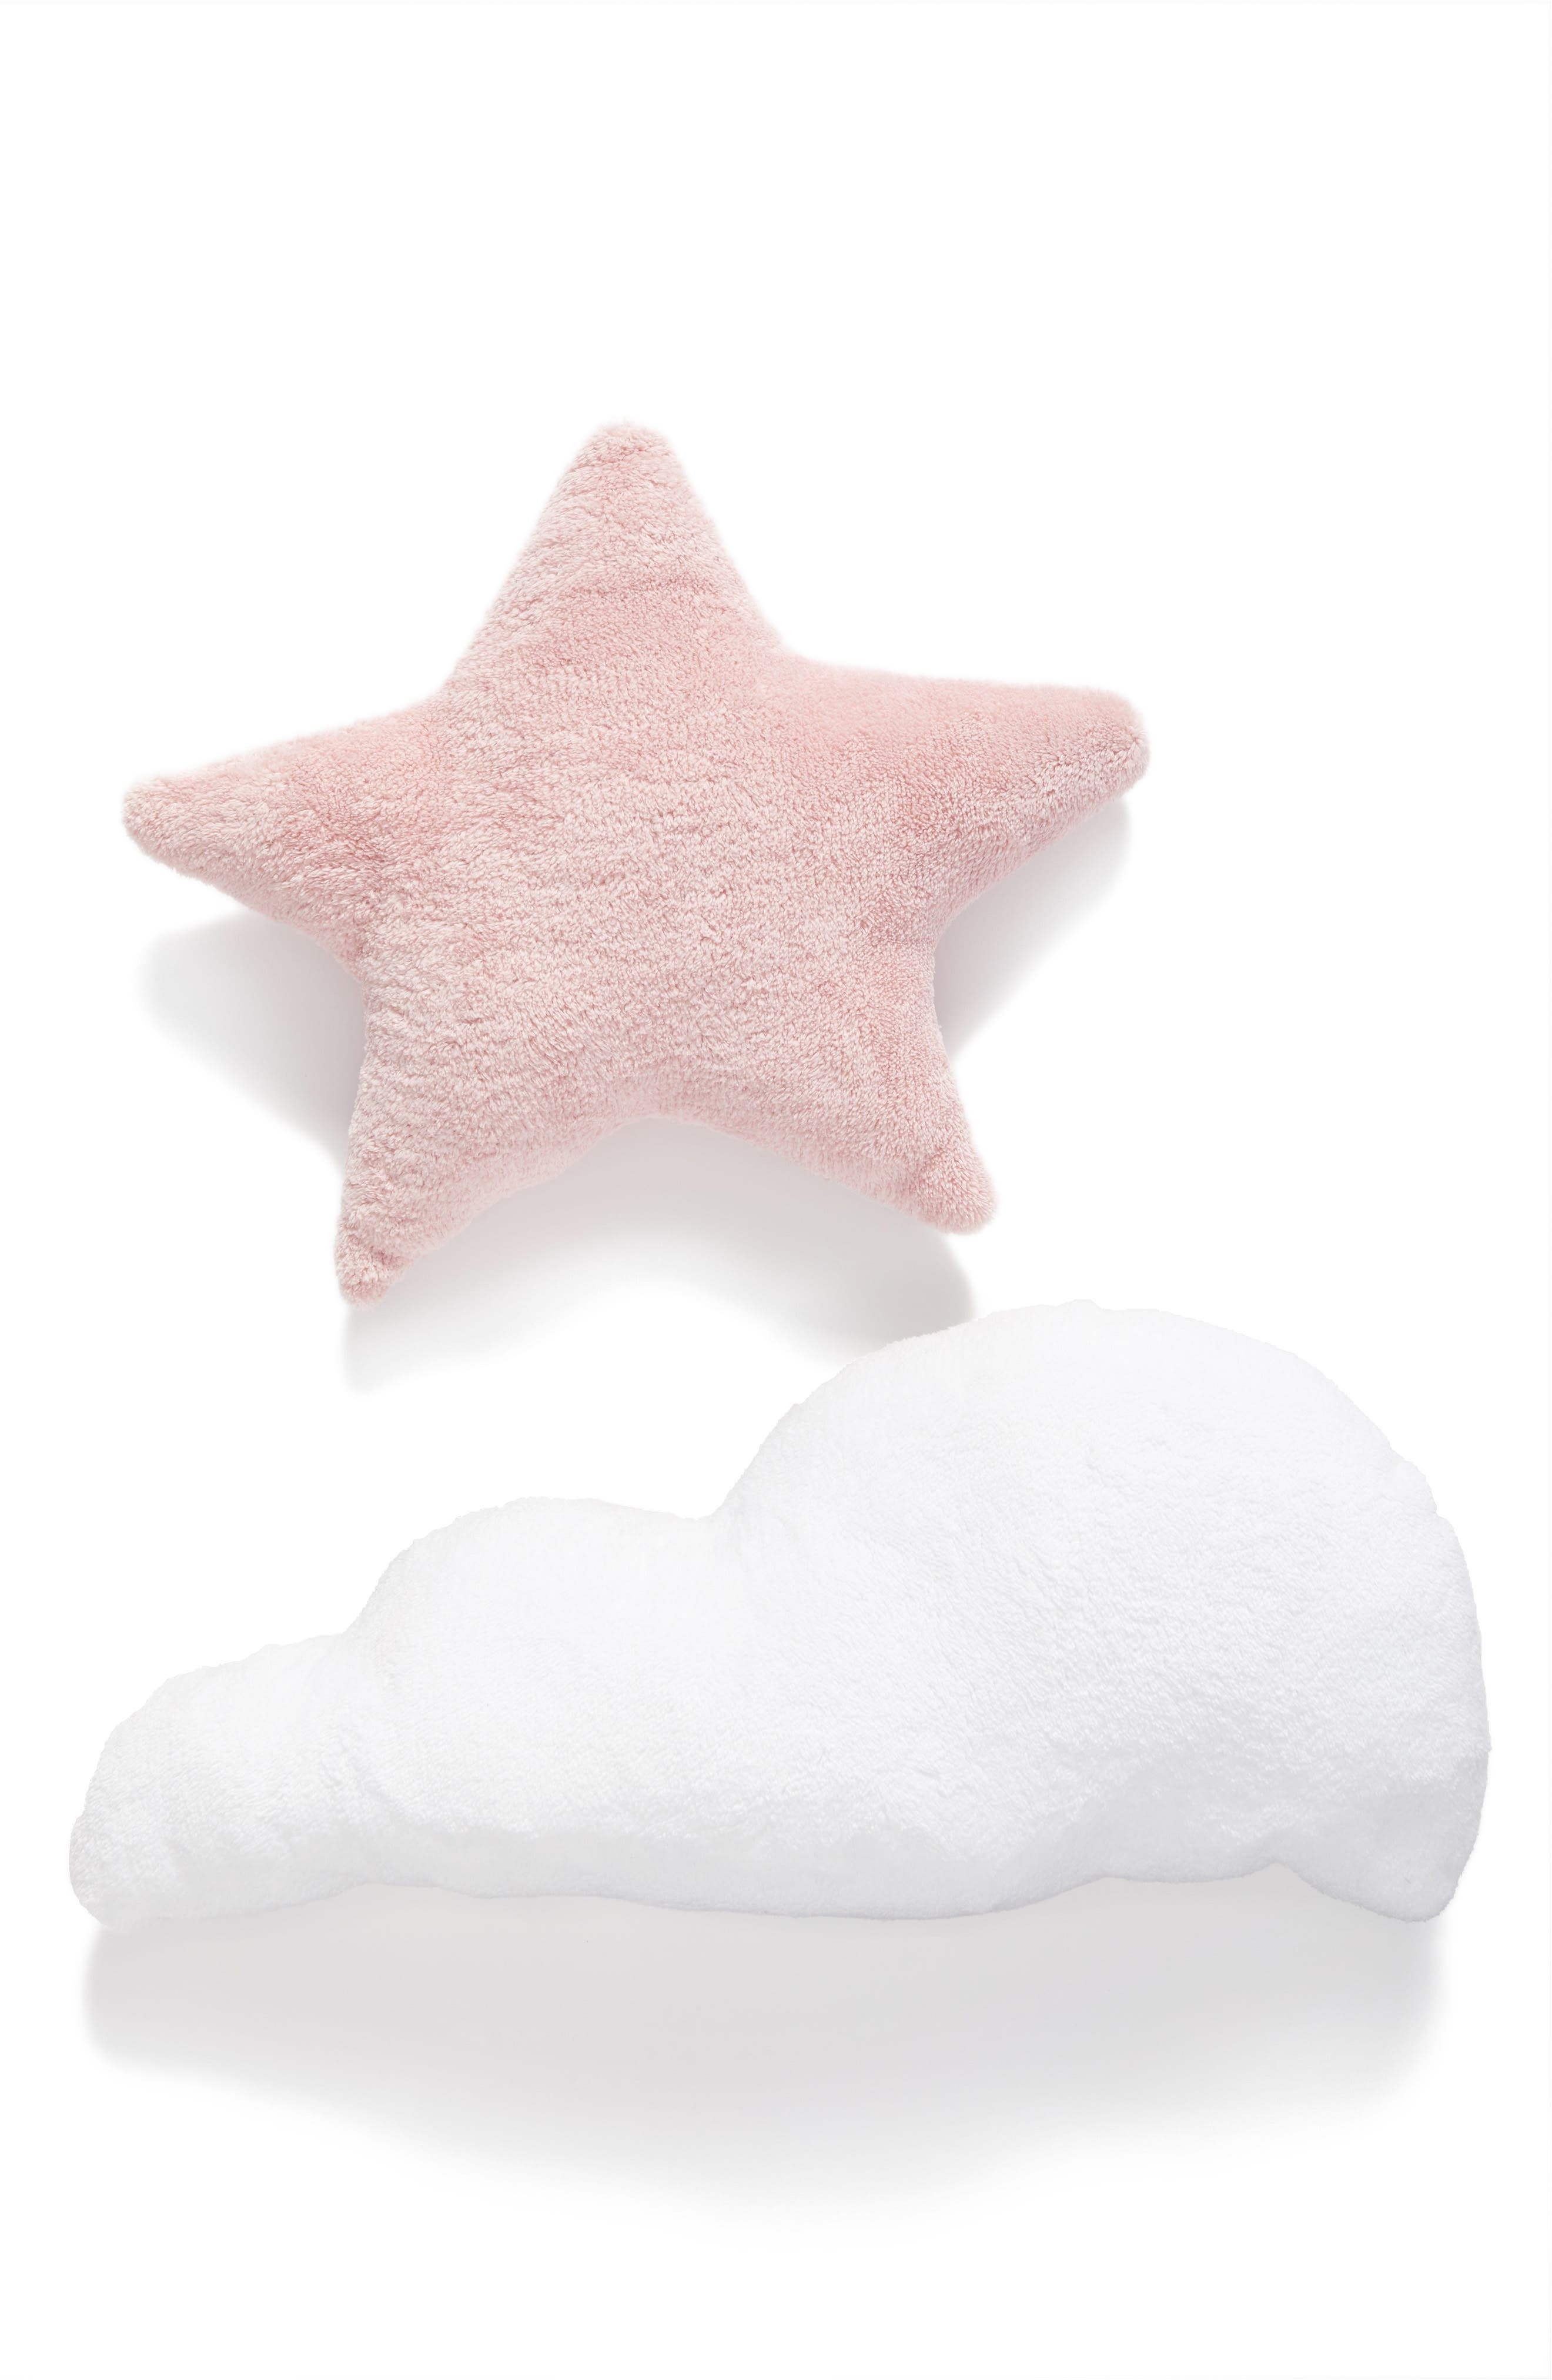 Oilo Cloud  Star Pillows